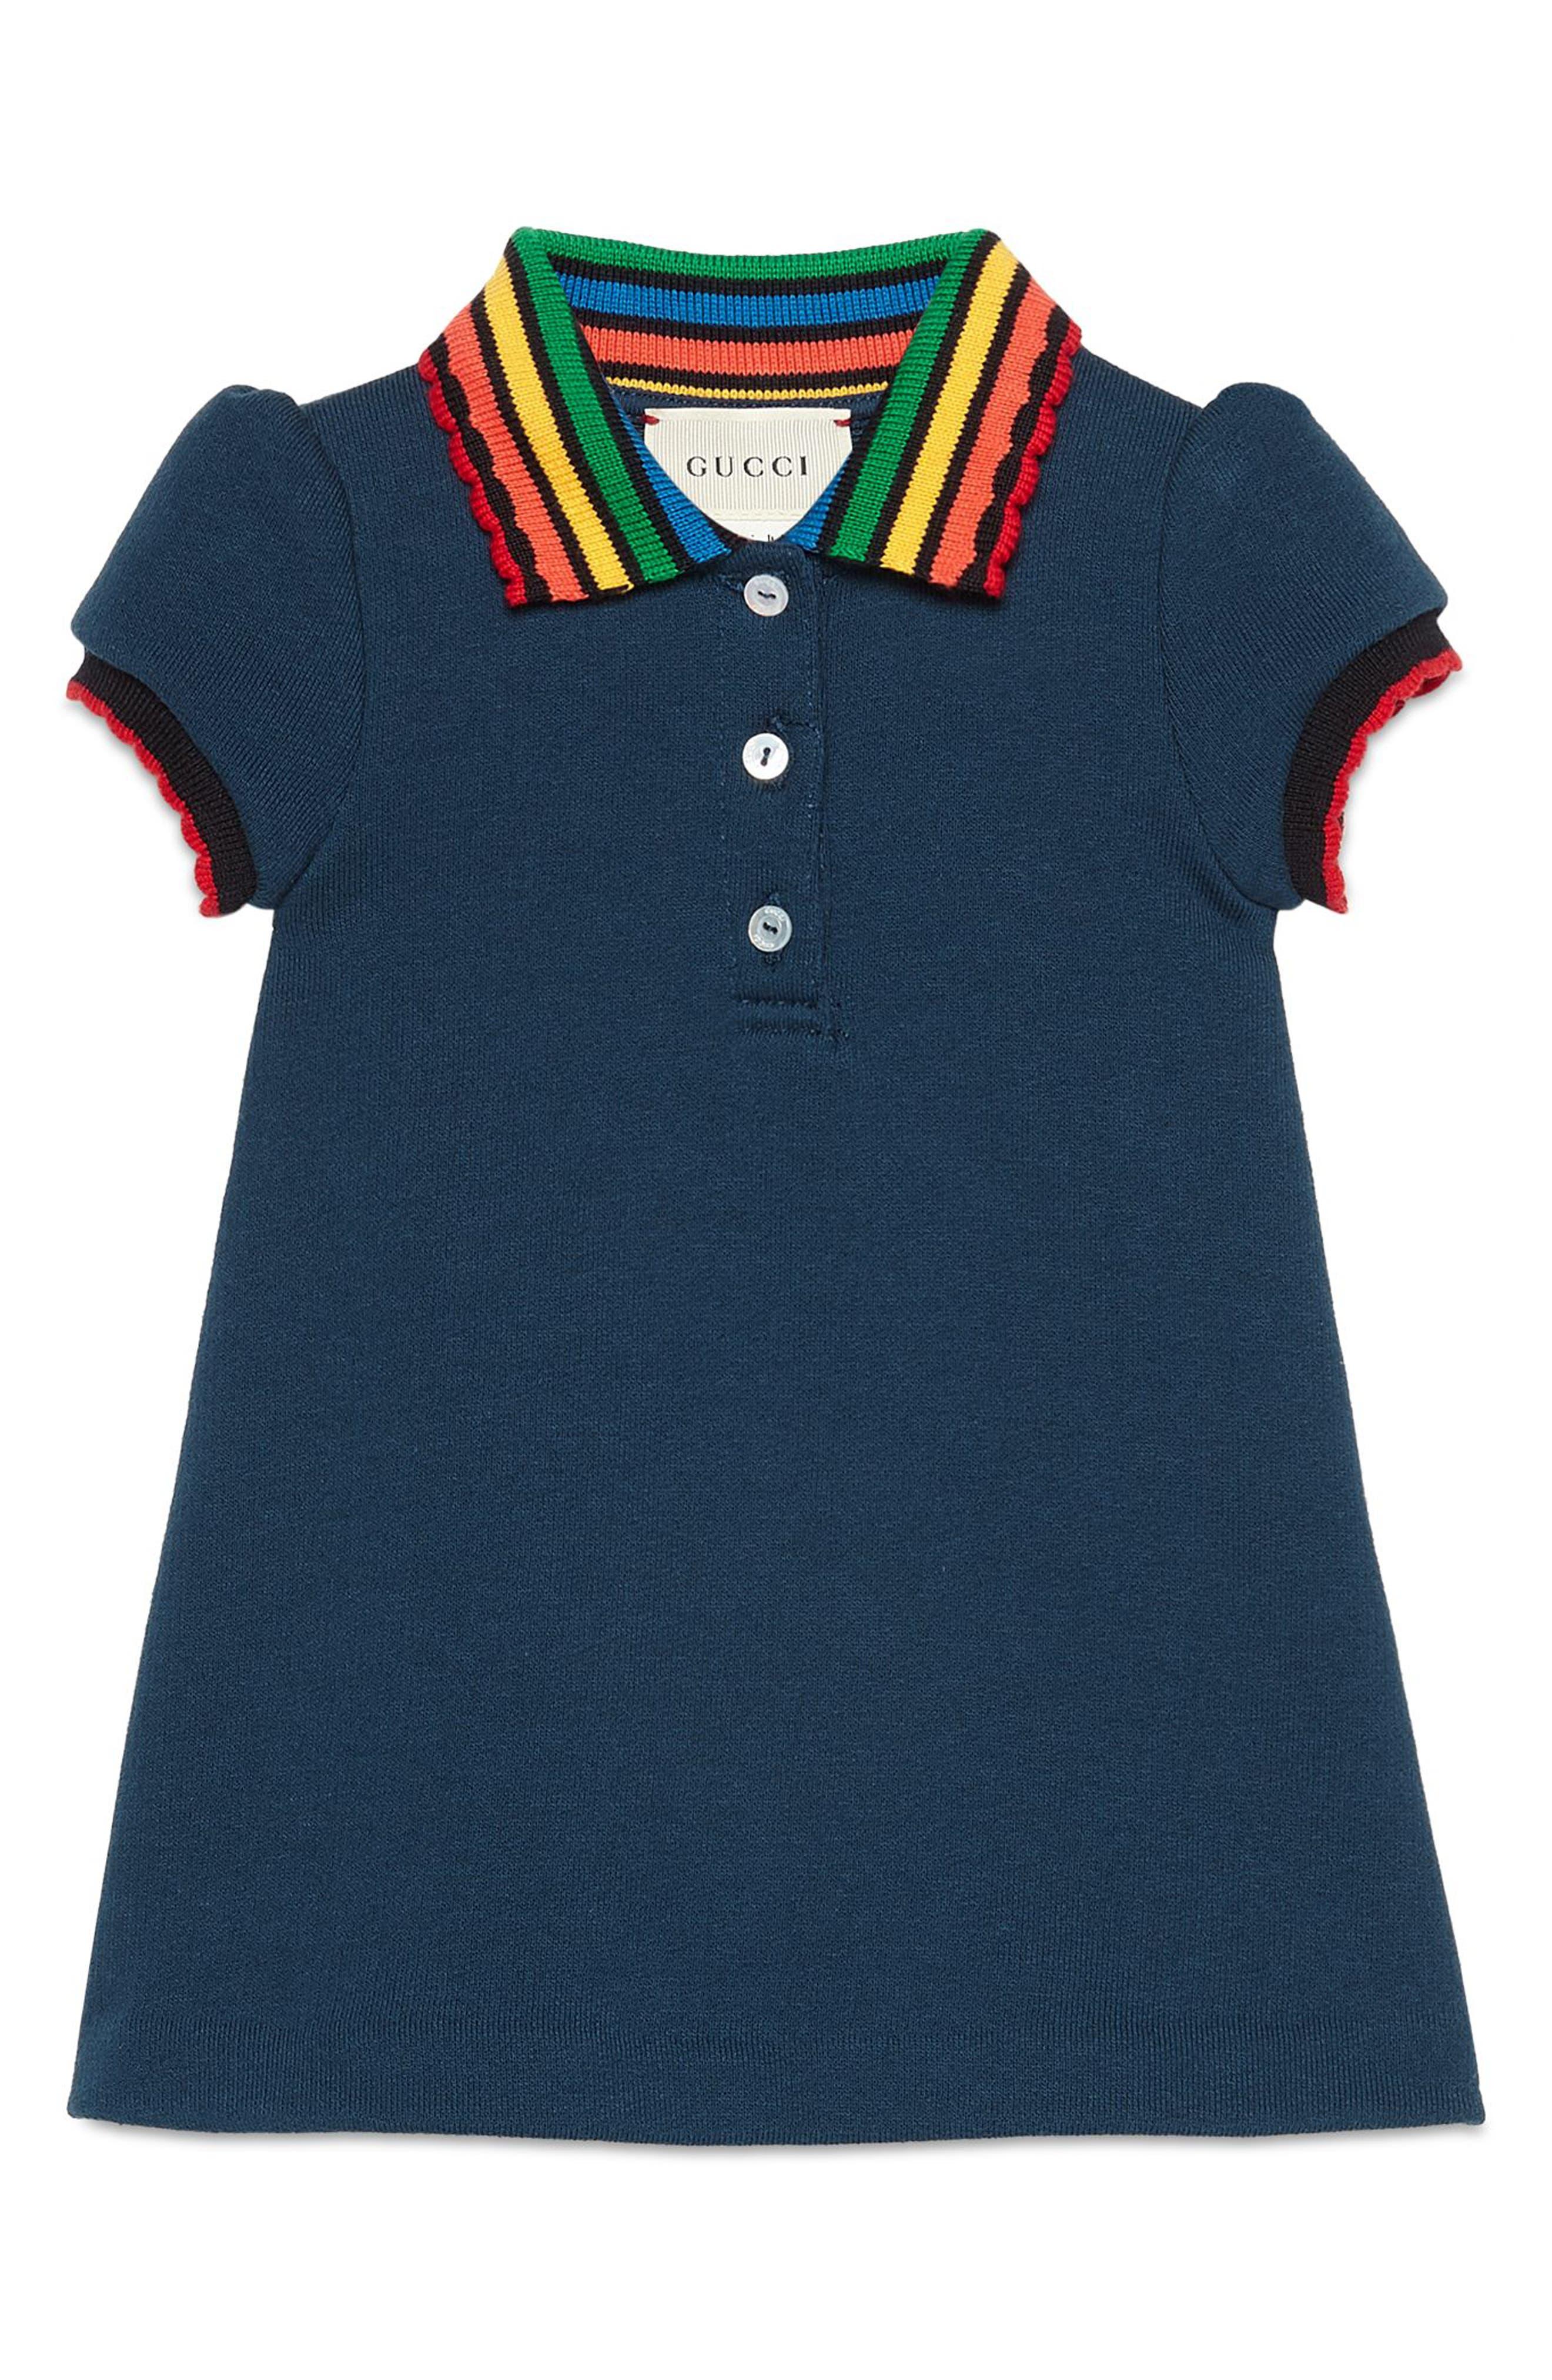 GUCCI Fawns Polo Dress, Main, color, 400